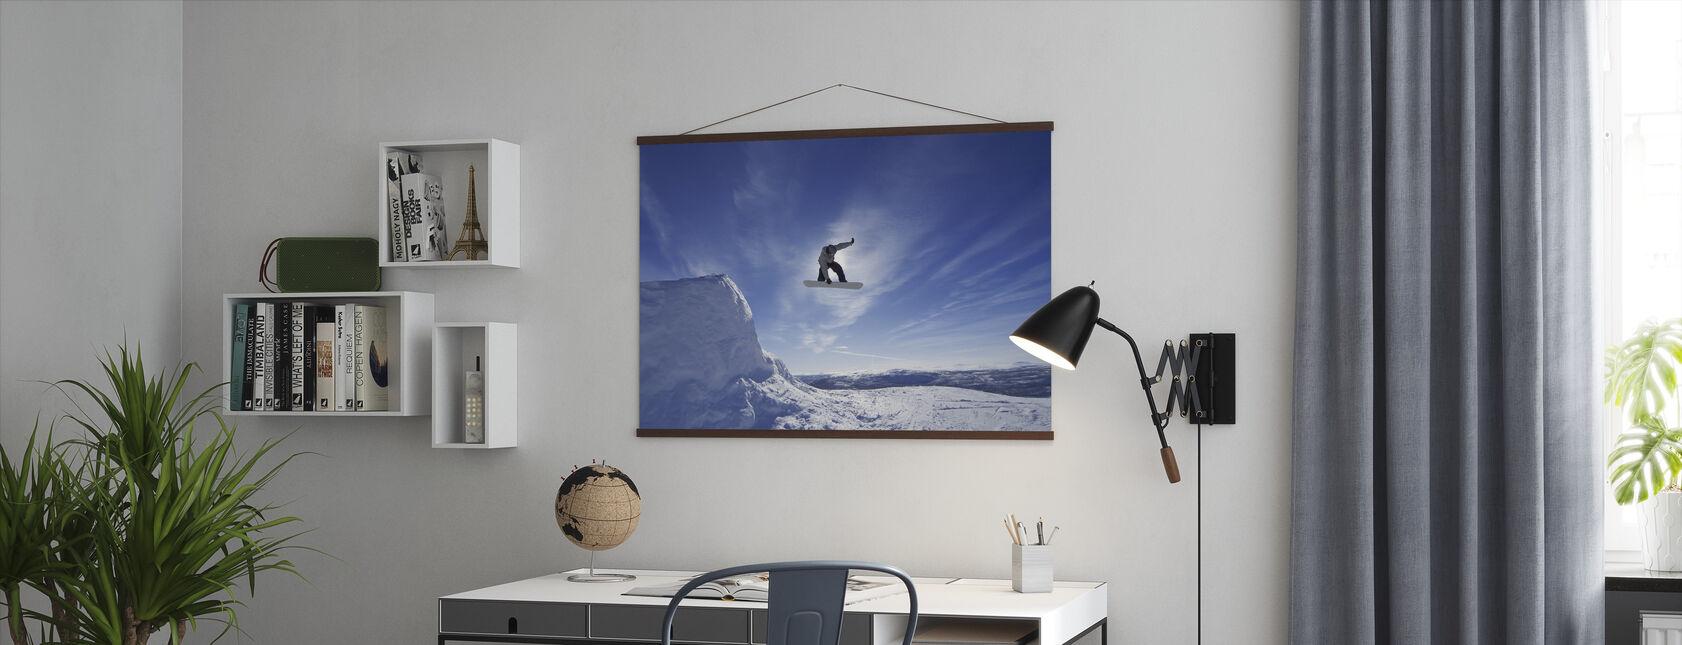 Snowboard Big Air Jump - Poster - Kantoor